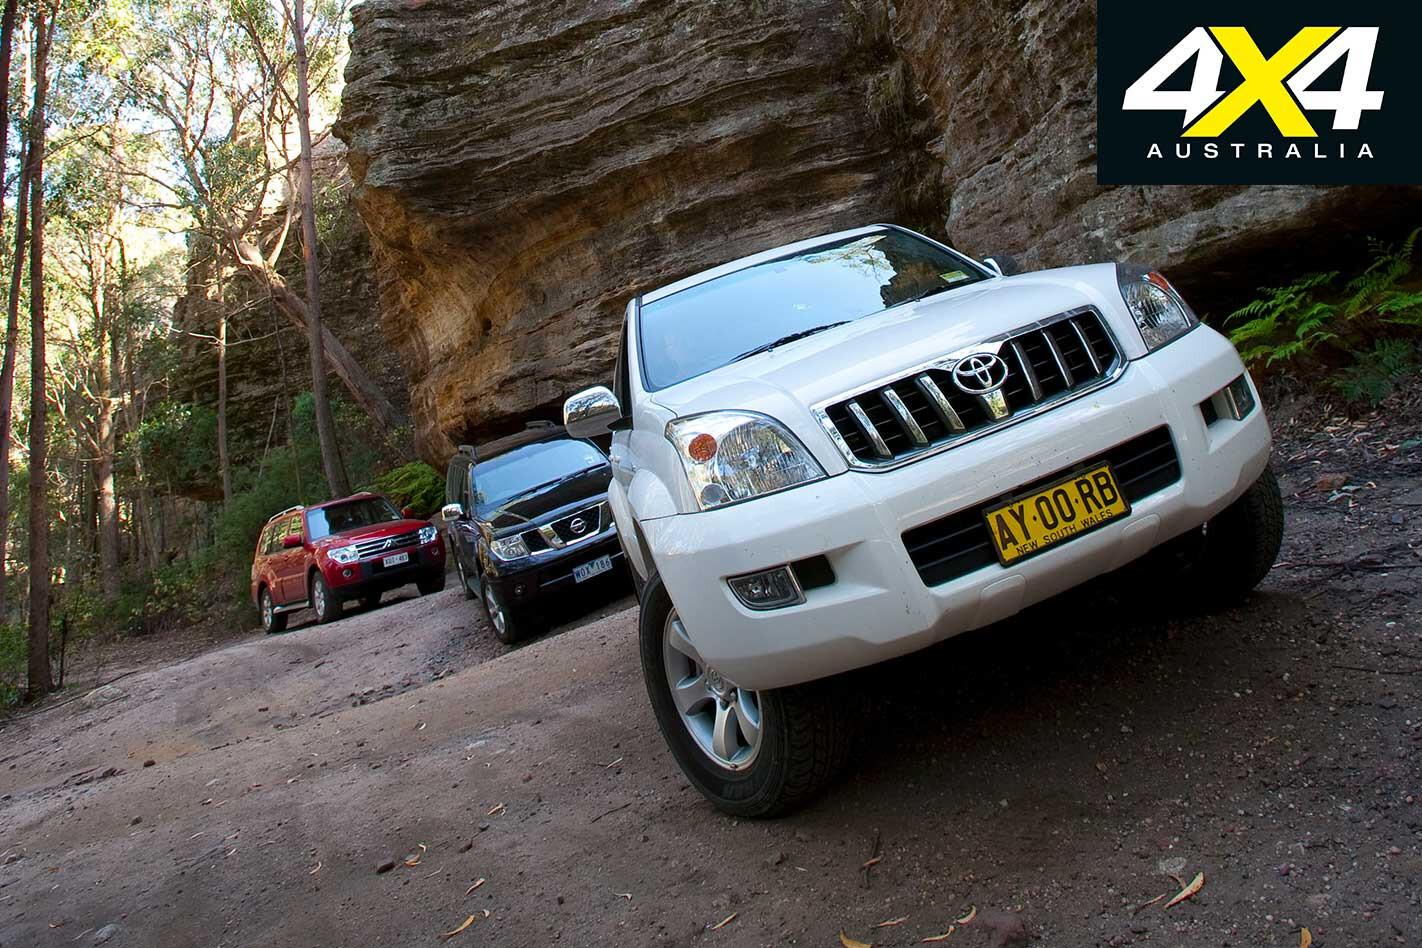 2009 Pajero Vs Pathfinder Vs Prado Comparison Off Road Jpg